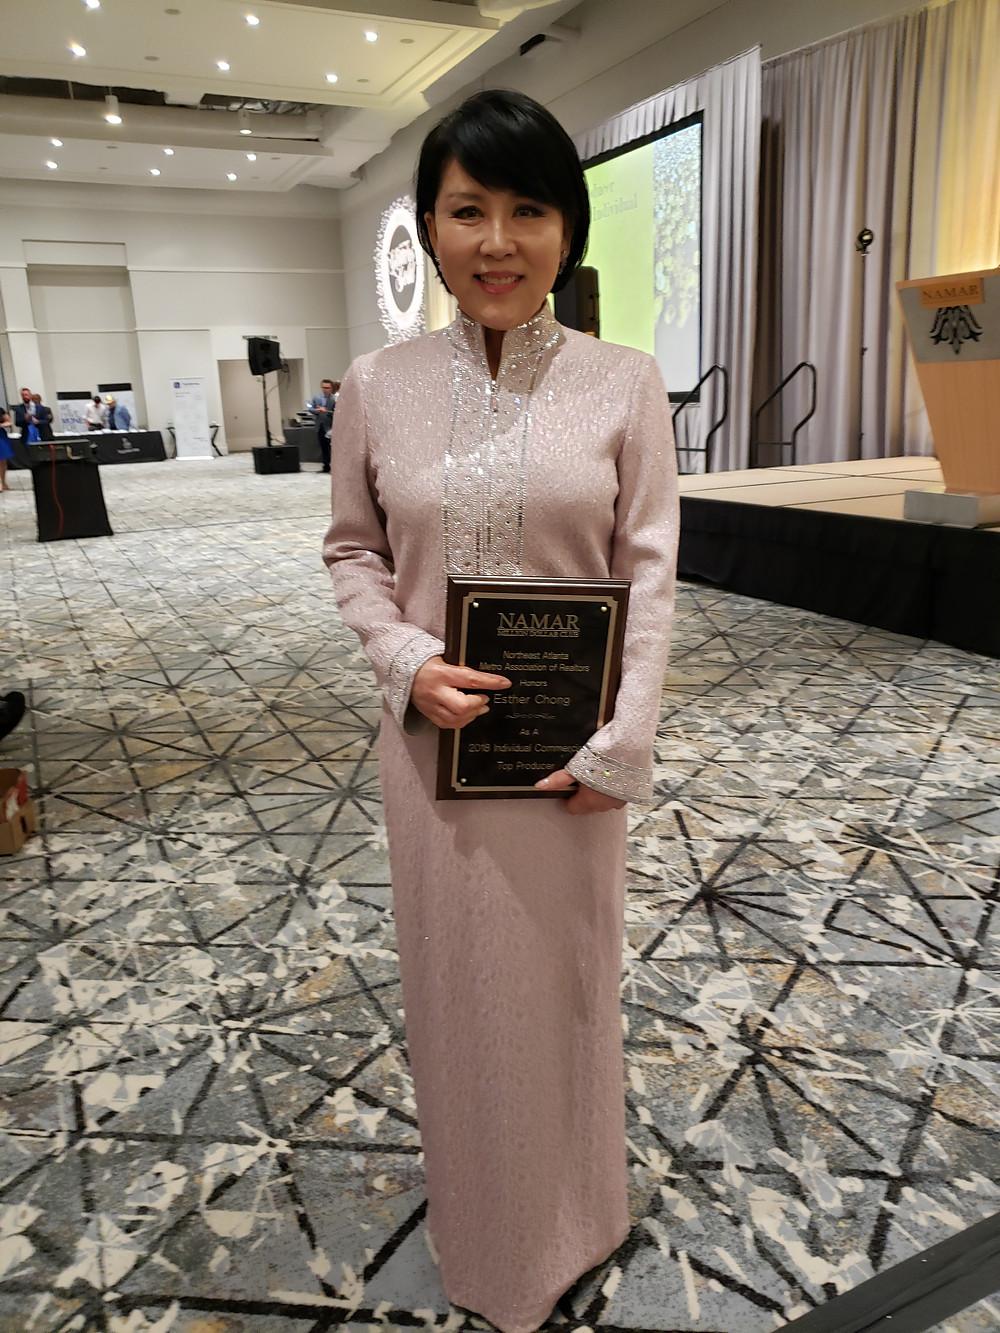 Esther Chong accepting 2018 NAMAR #1 Commercial award